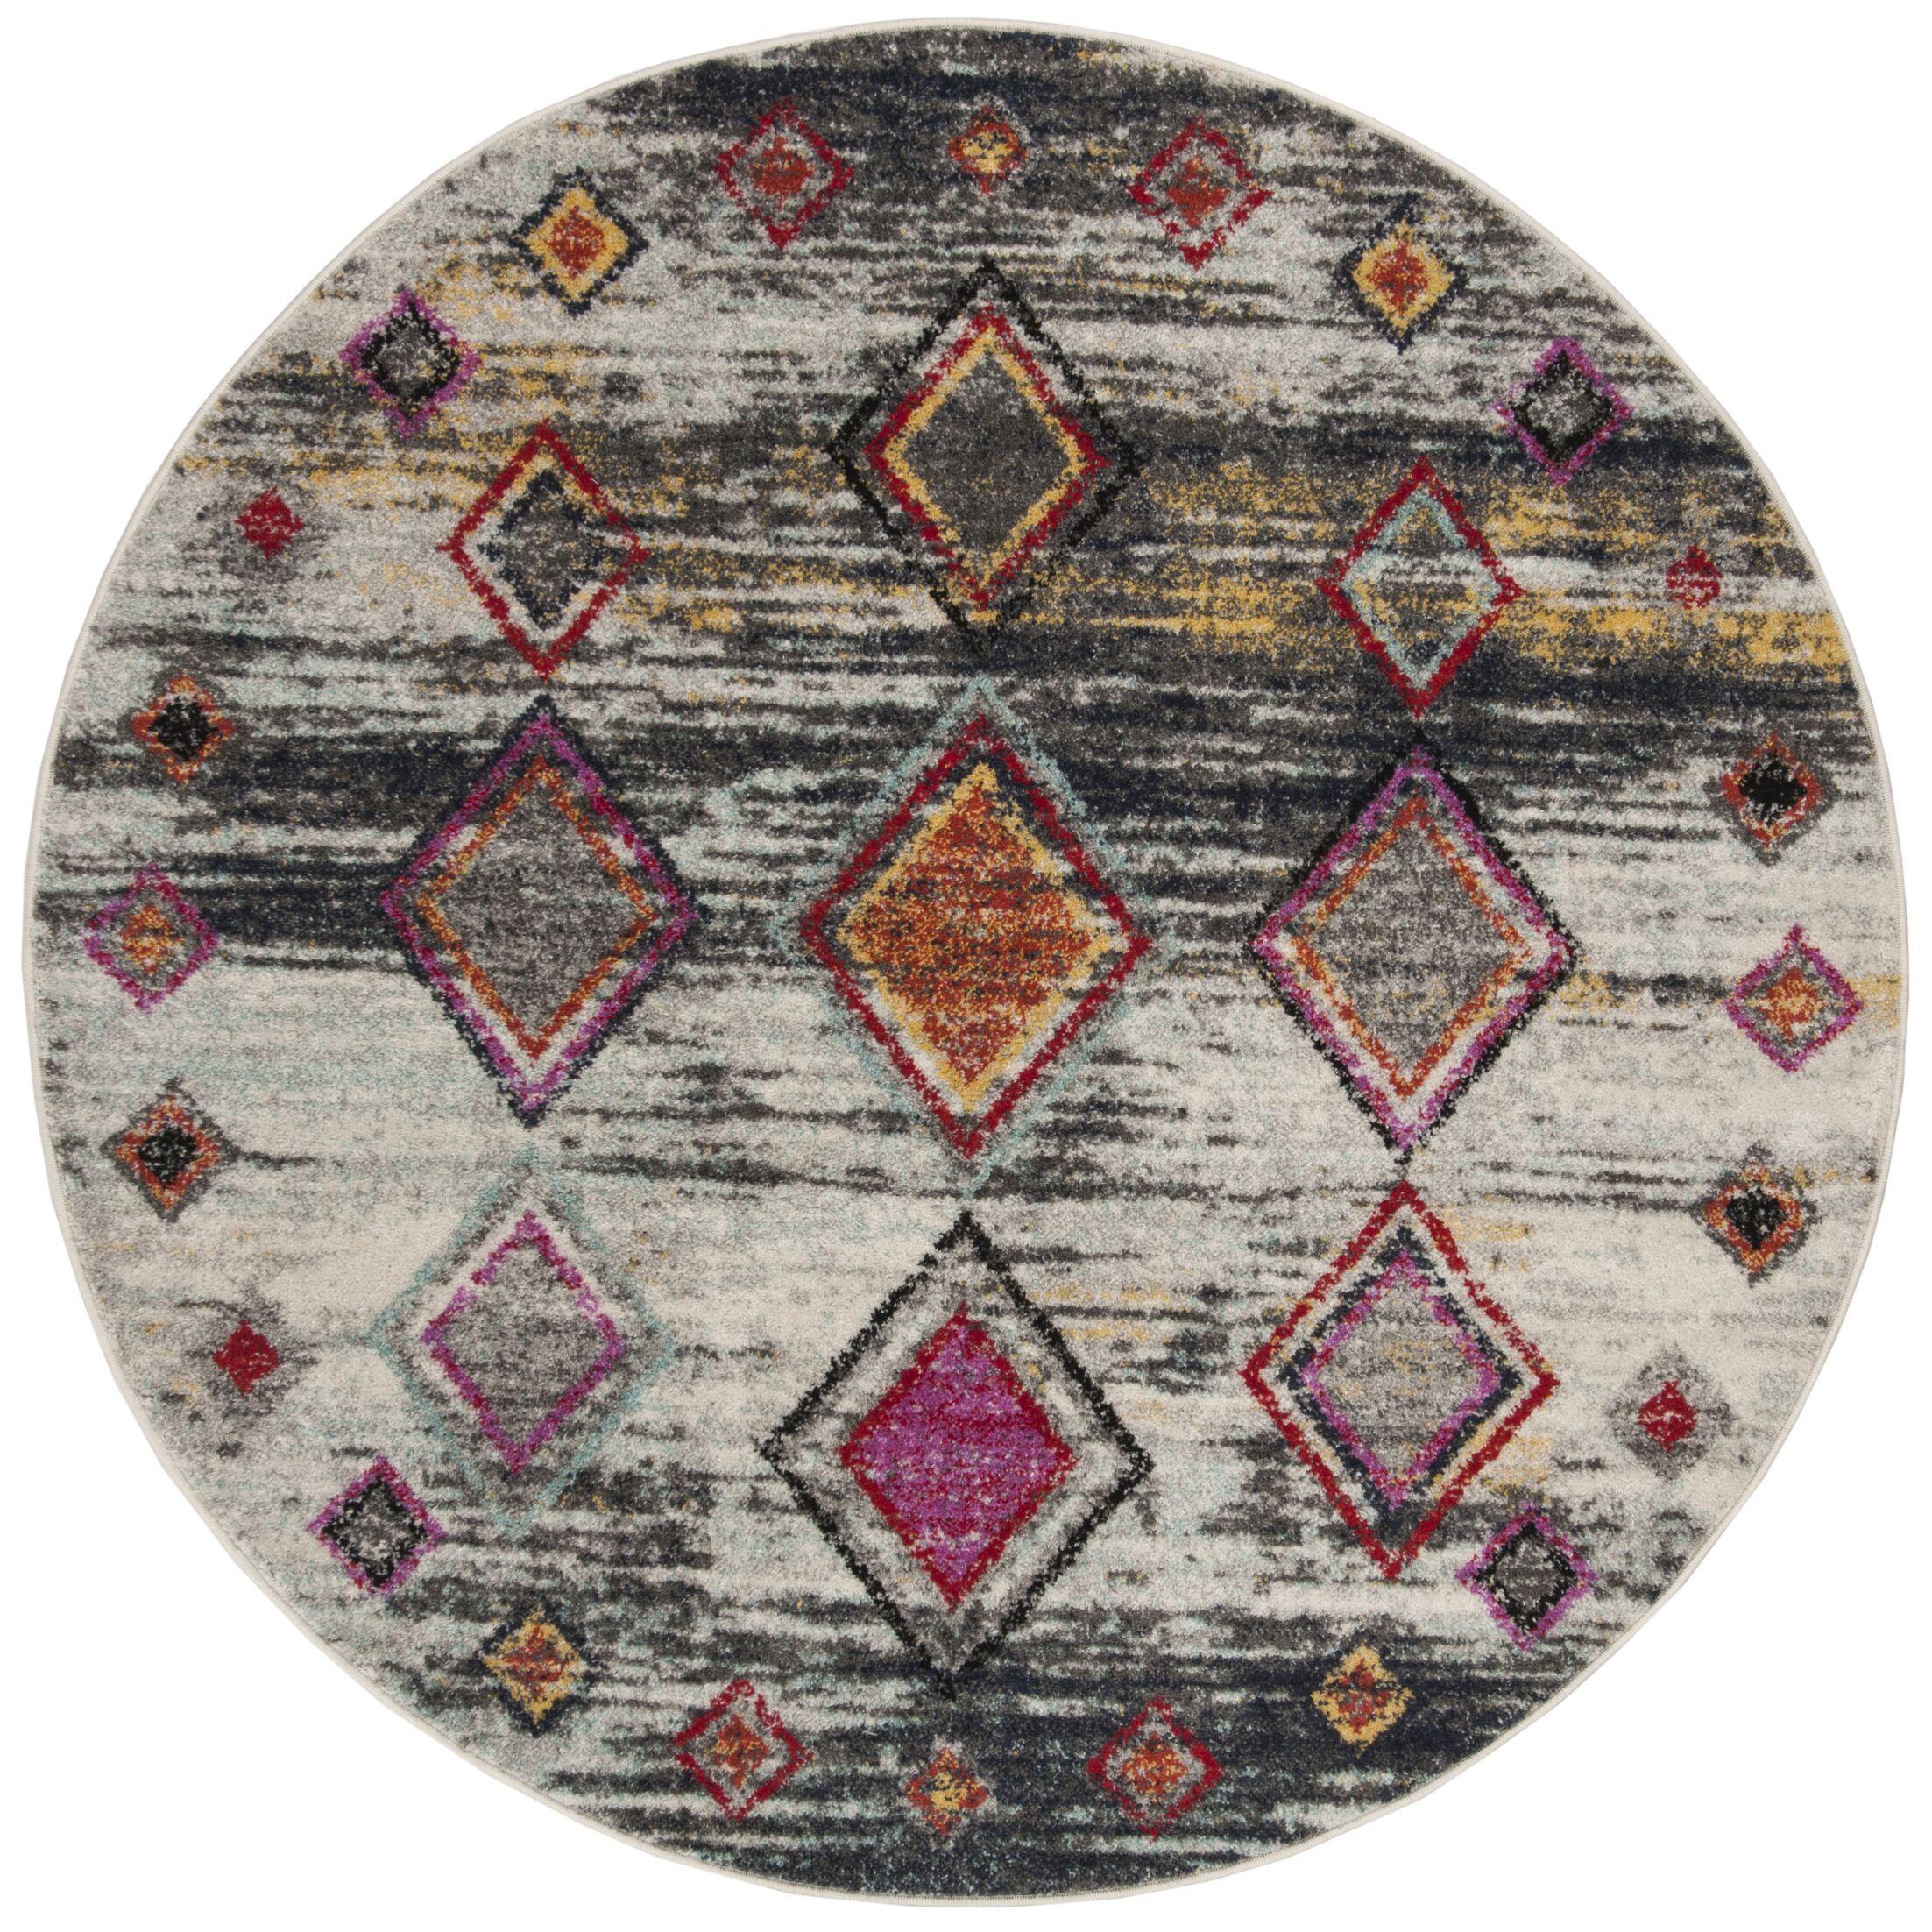 Muniz Light Gray/Red Area Rug Rug Size: Round 6' x 6'